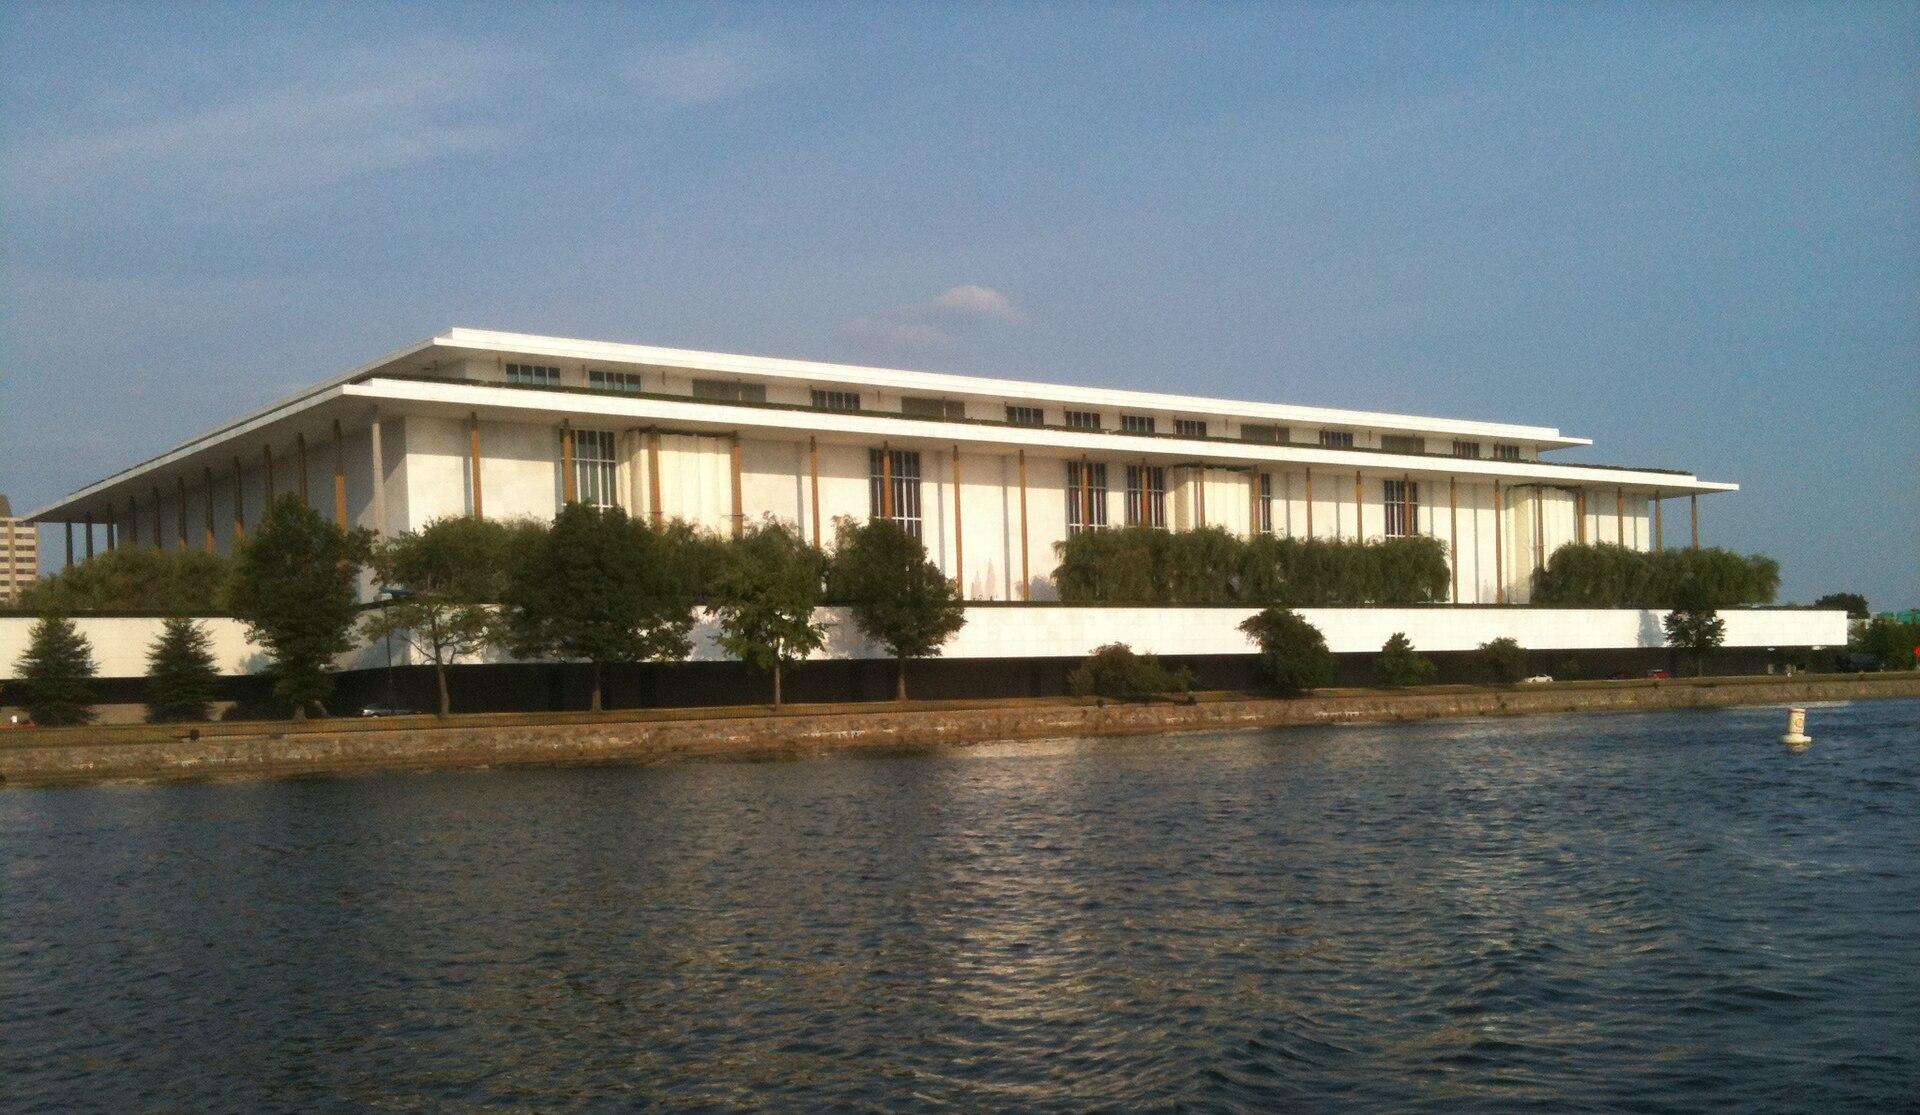 1920px-Kennedy_Center_seen_from_the_Potomac_River%2C_June_2010.jpg.jpg